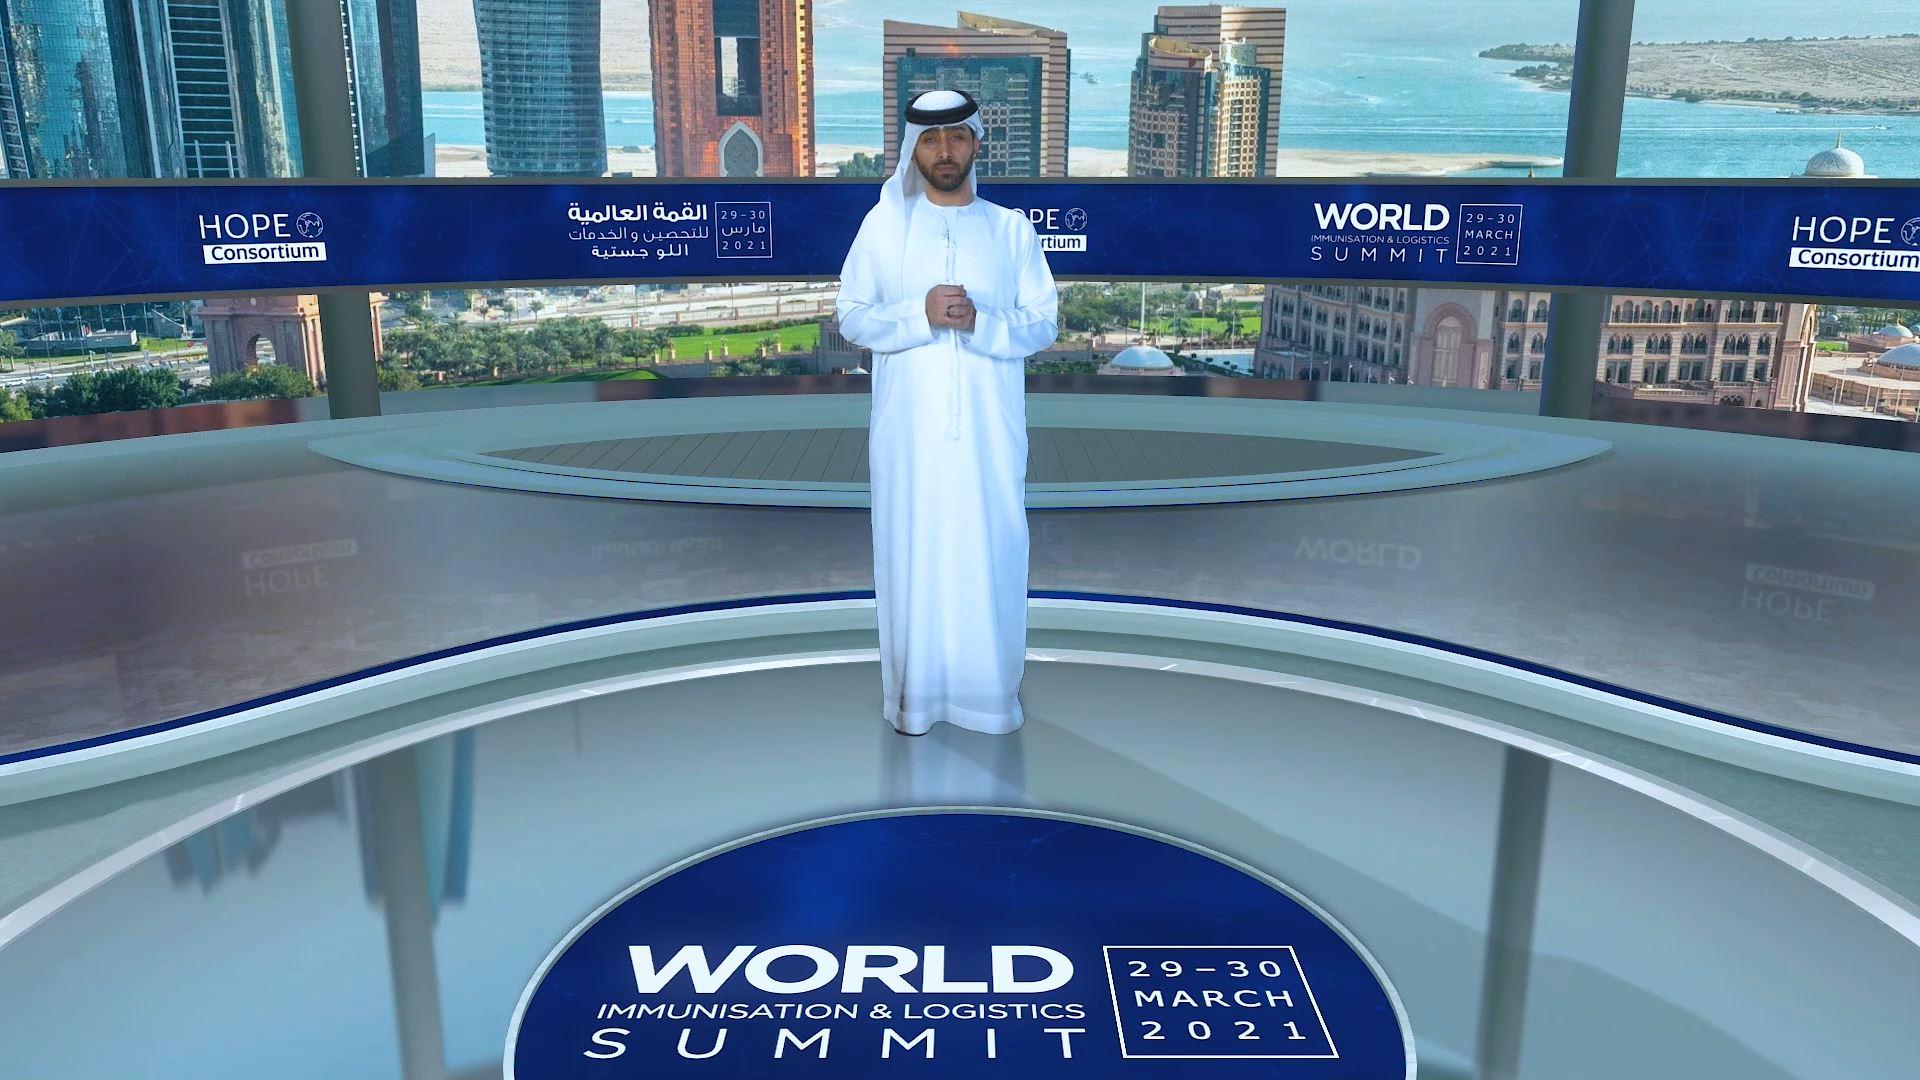 hope consortium world immunization and logistics summit virtual exhibition virtual host